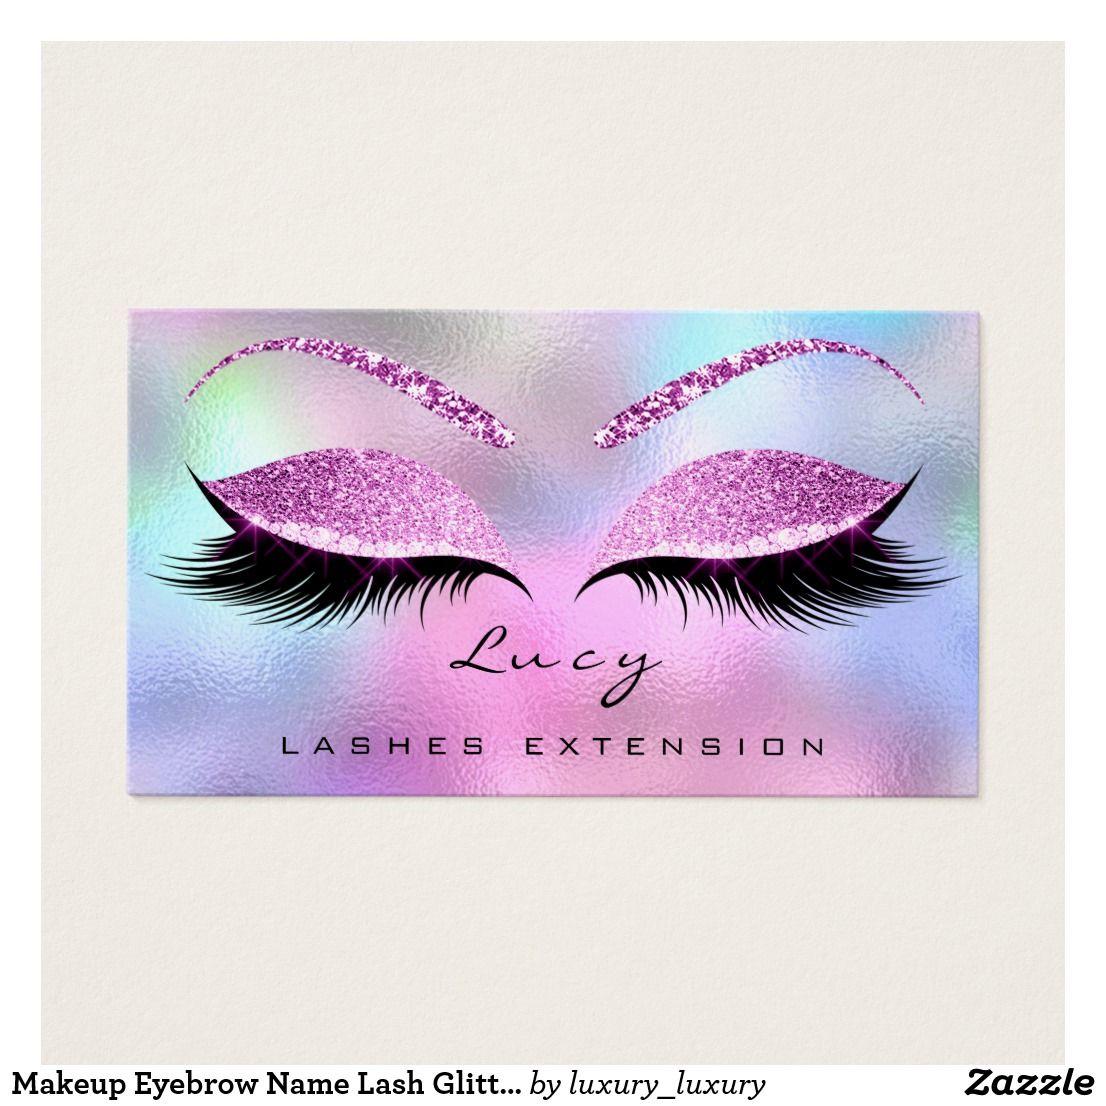 Makeup Eyebrow Name Lash Glitter Pink Purple Business Card